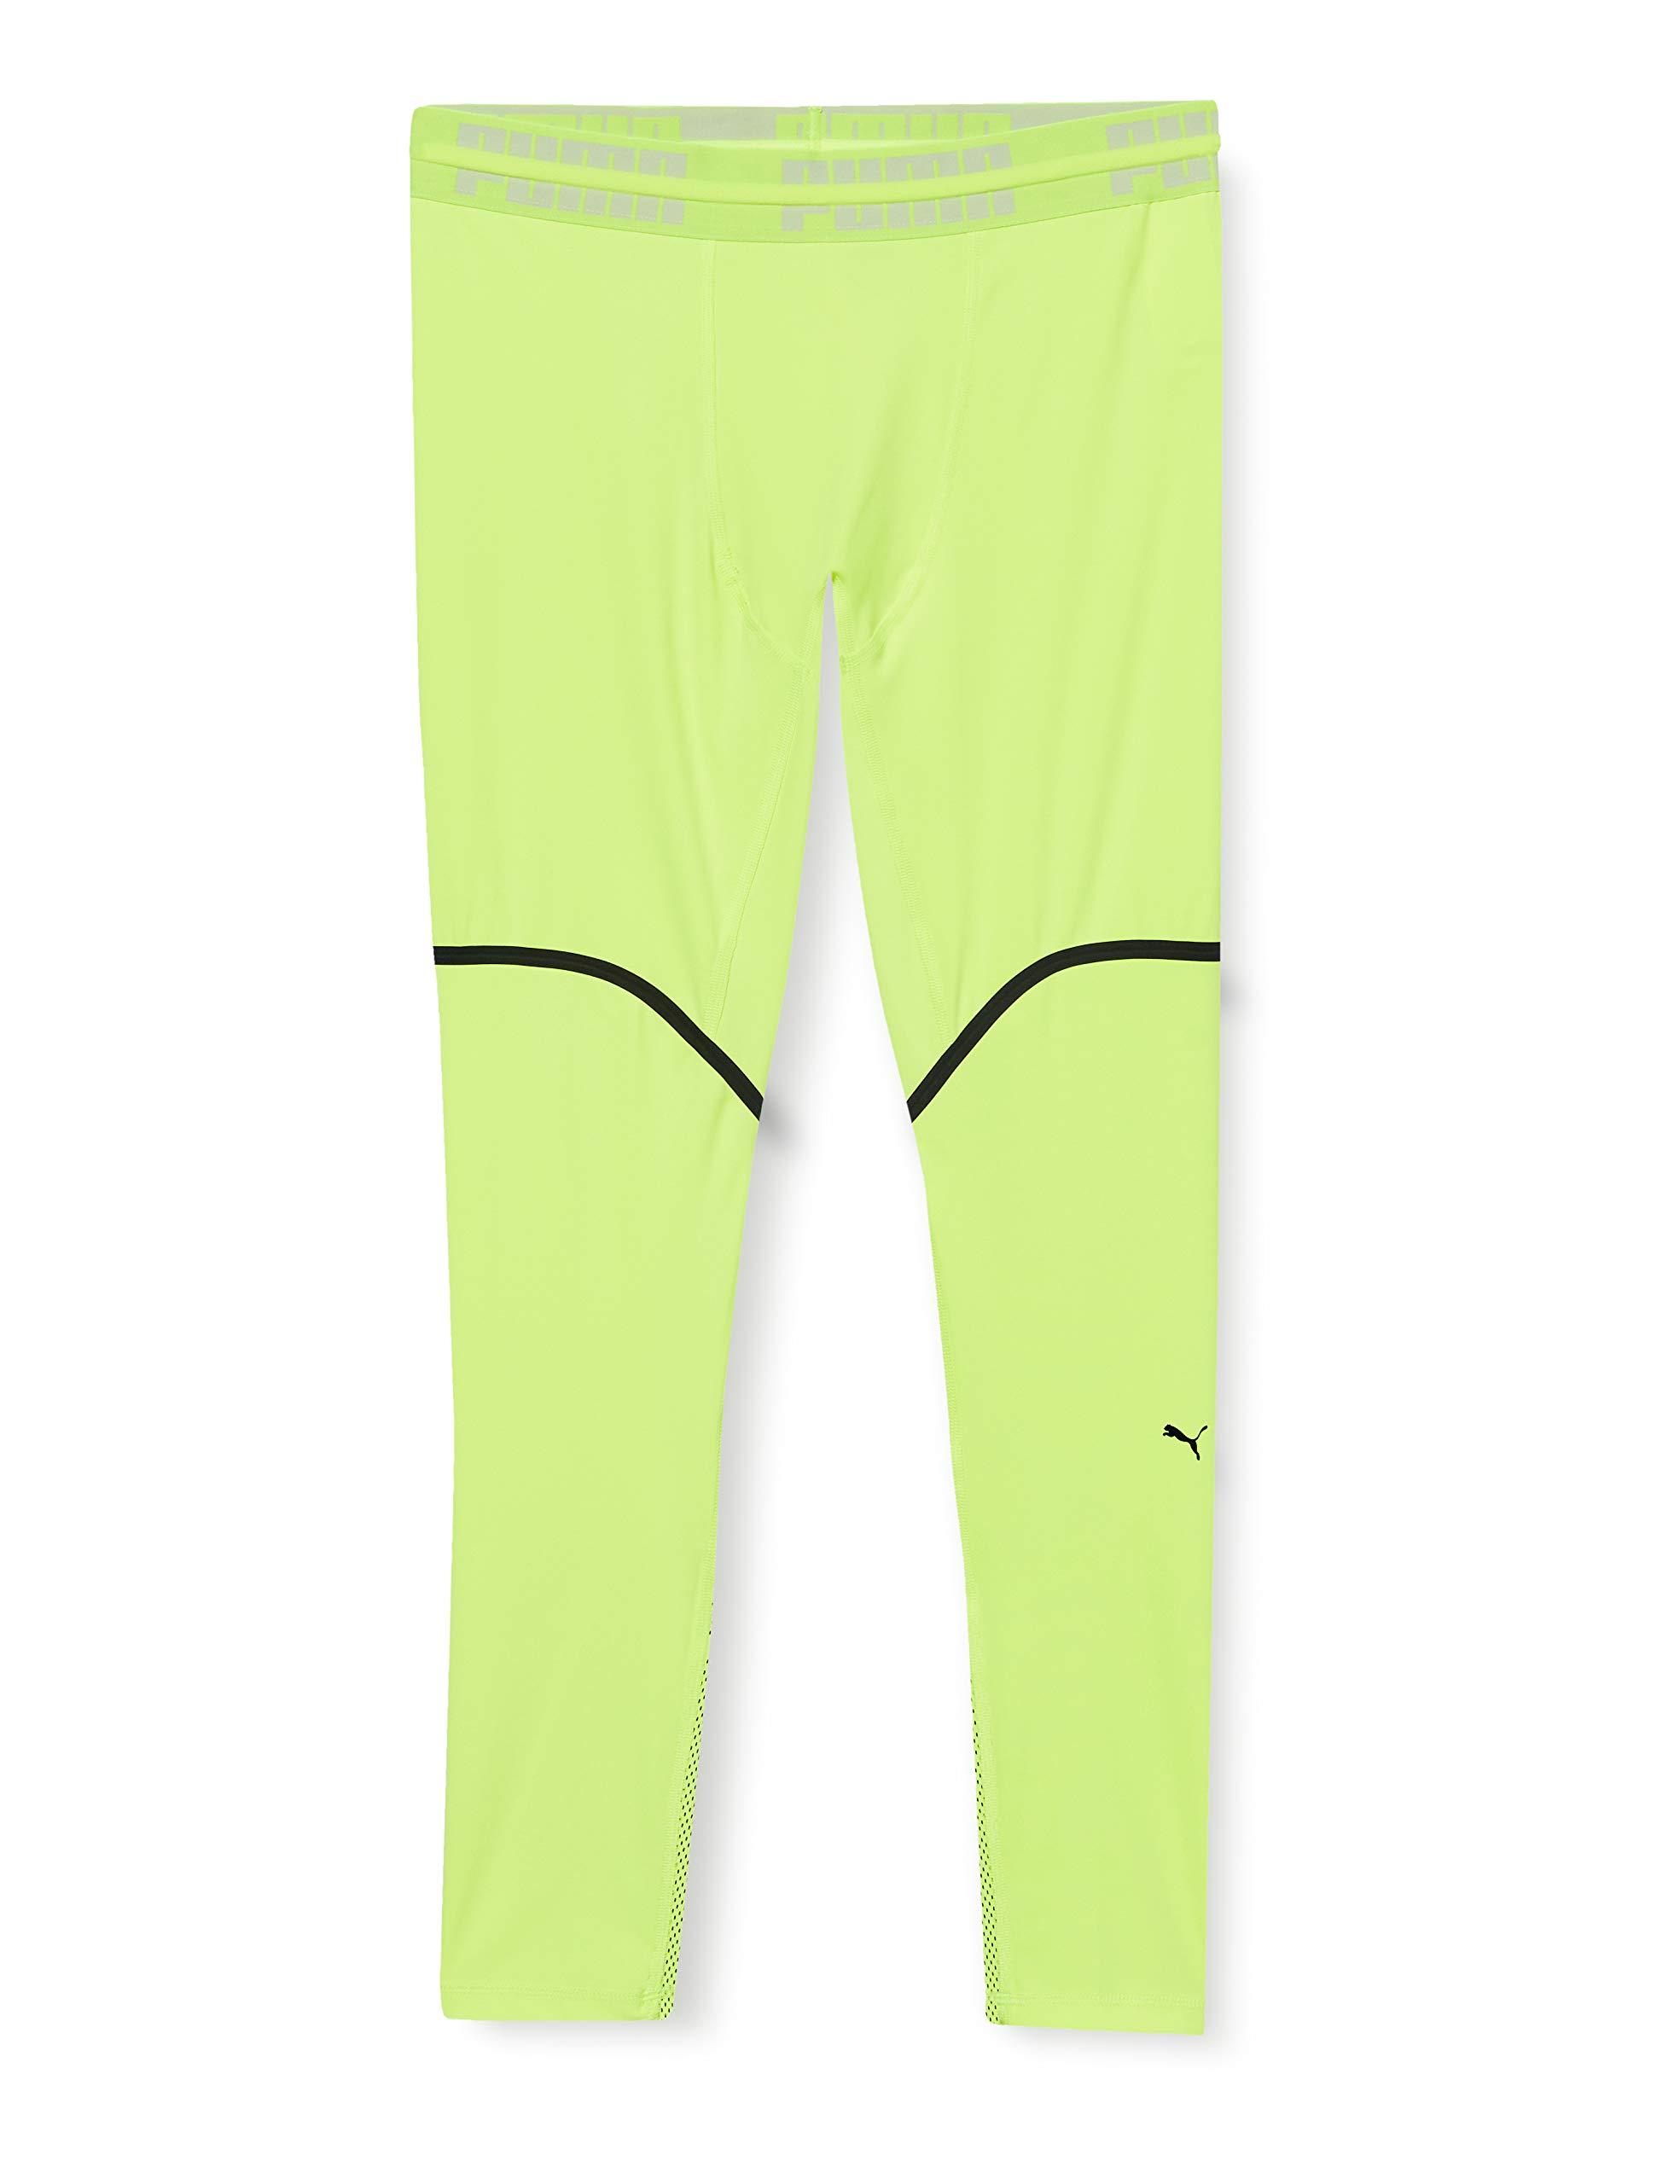 PUMA Herren First Mile Extreme EXO-Adapt Long Tight Leggings, Fizzy Yellow, XL